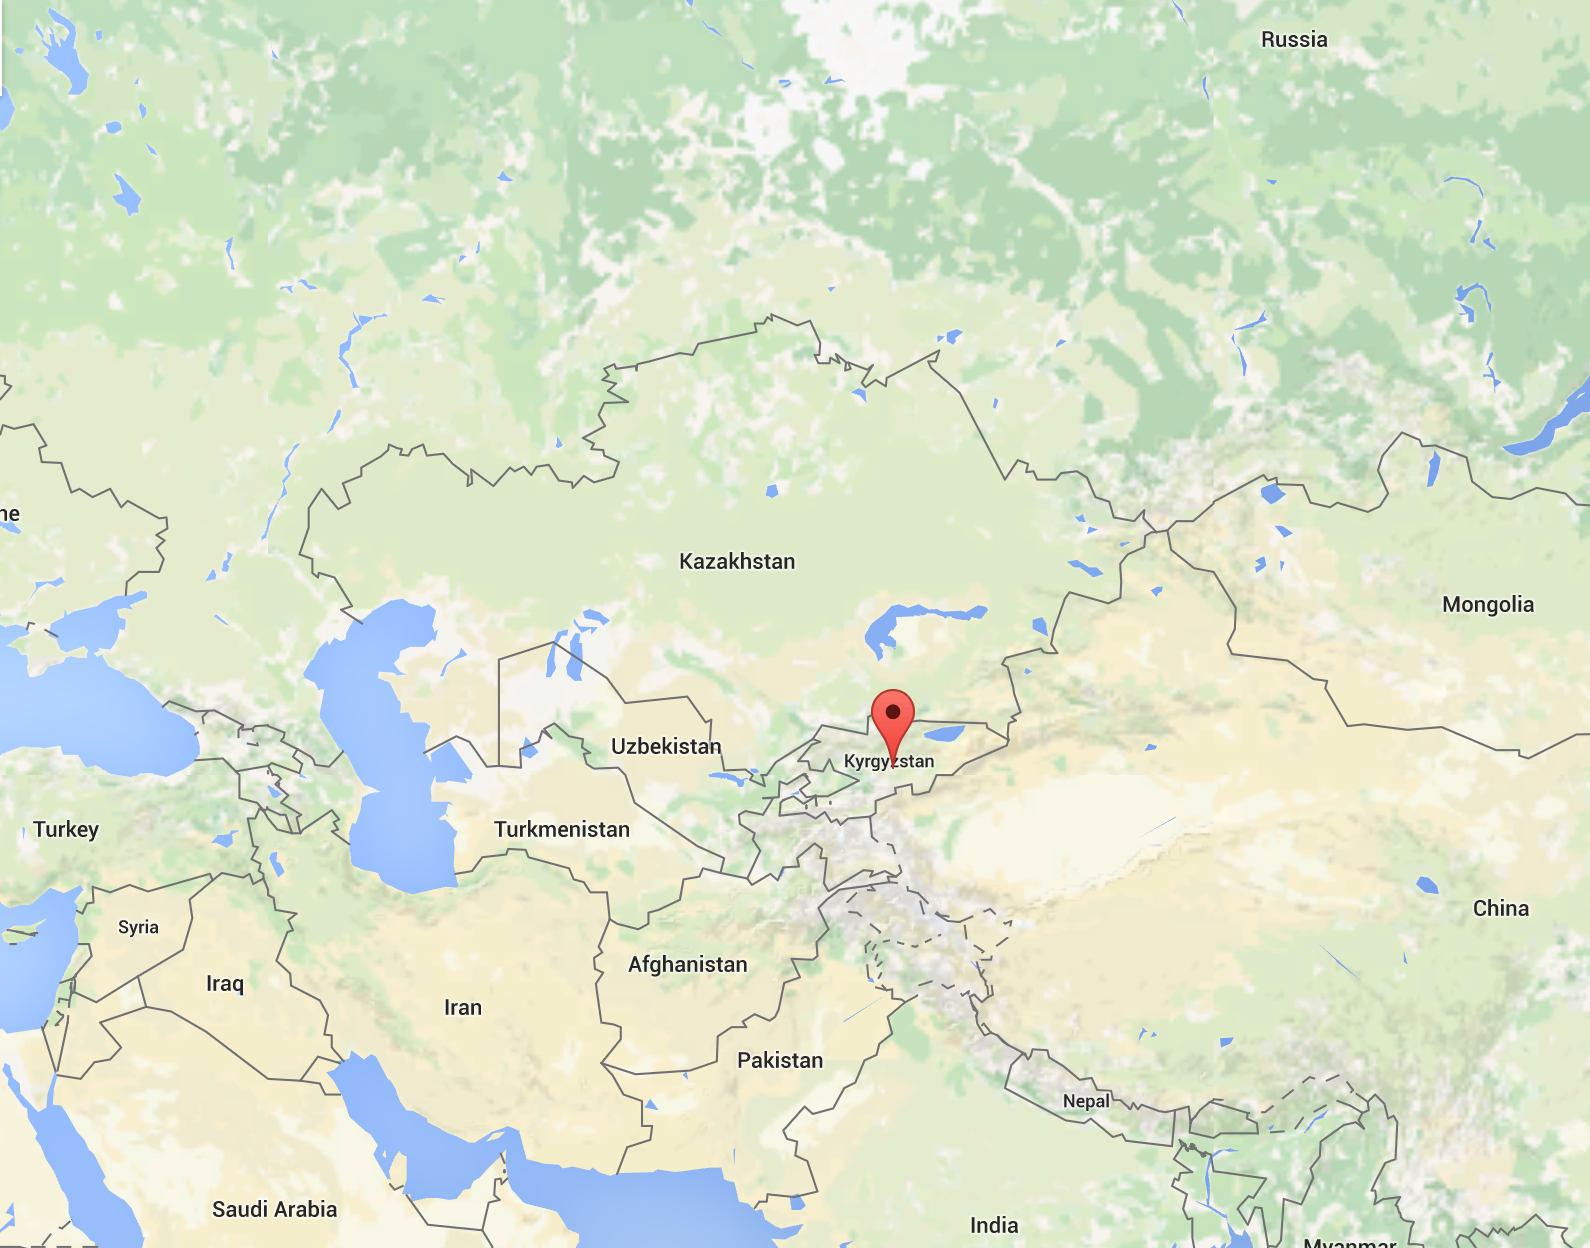 Map source: Google Maps